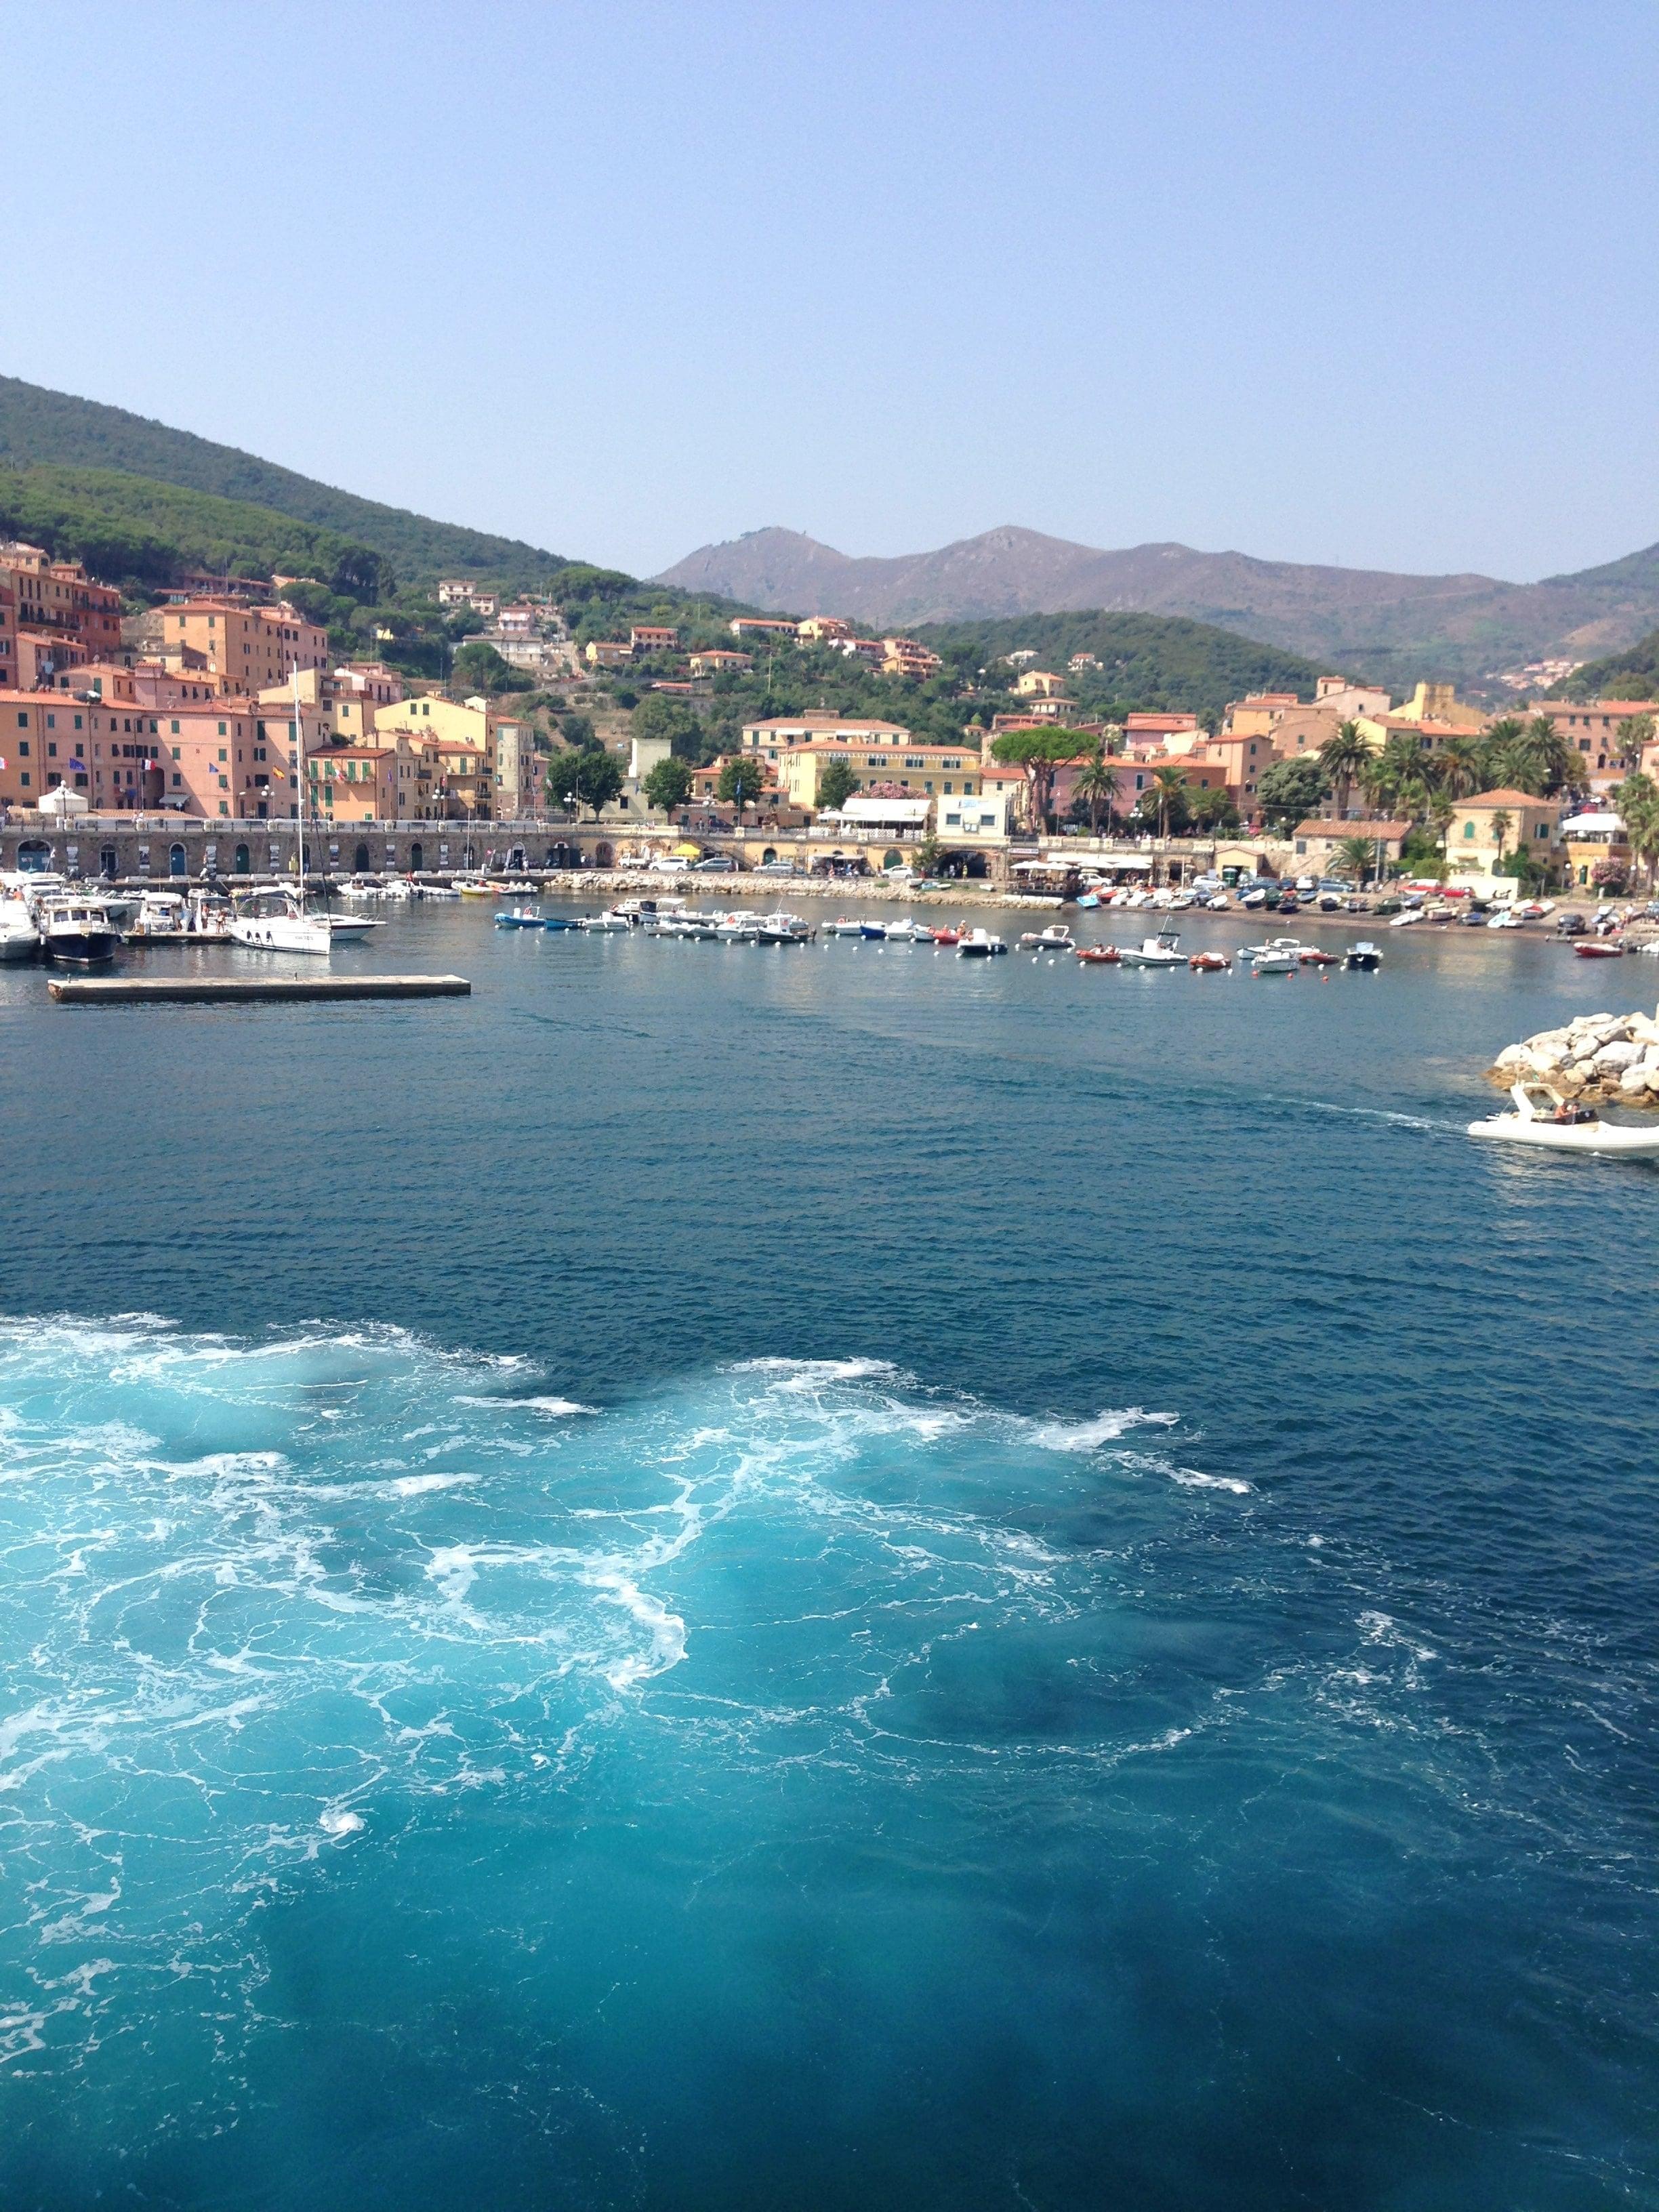 Vacanze all'Isola d'Elba con i bimbi - MammaPoppins